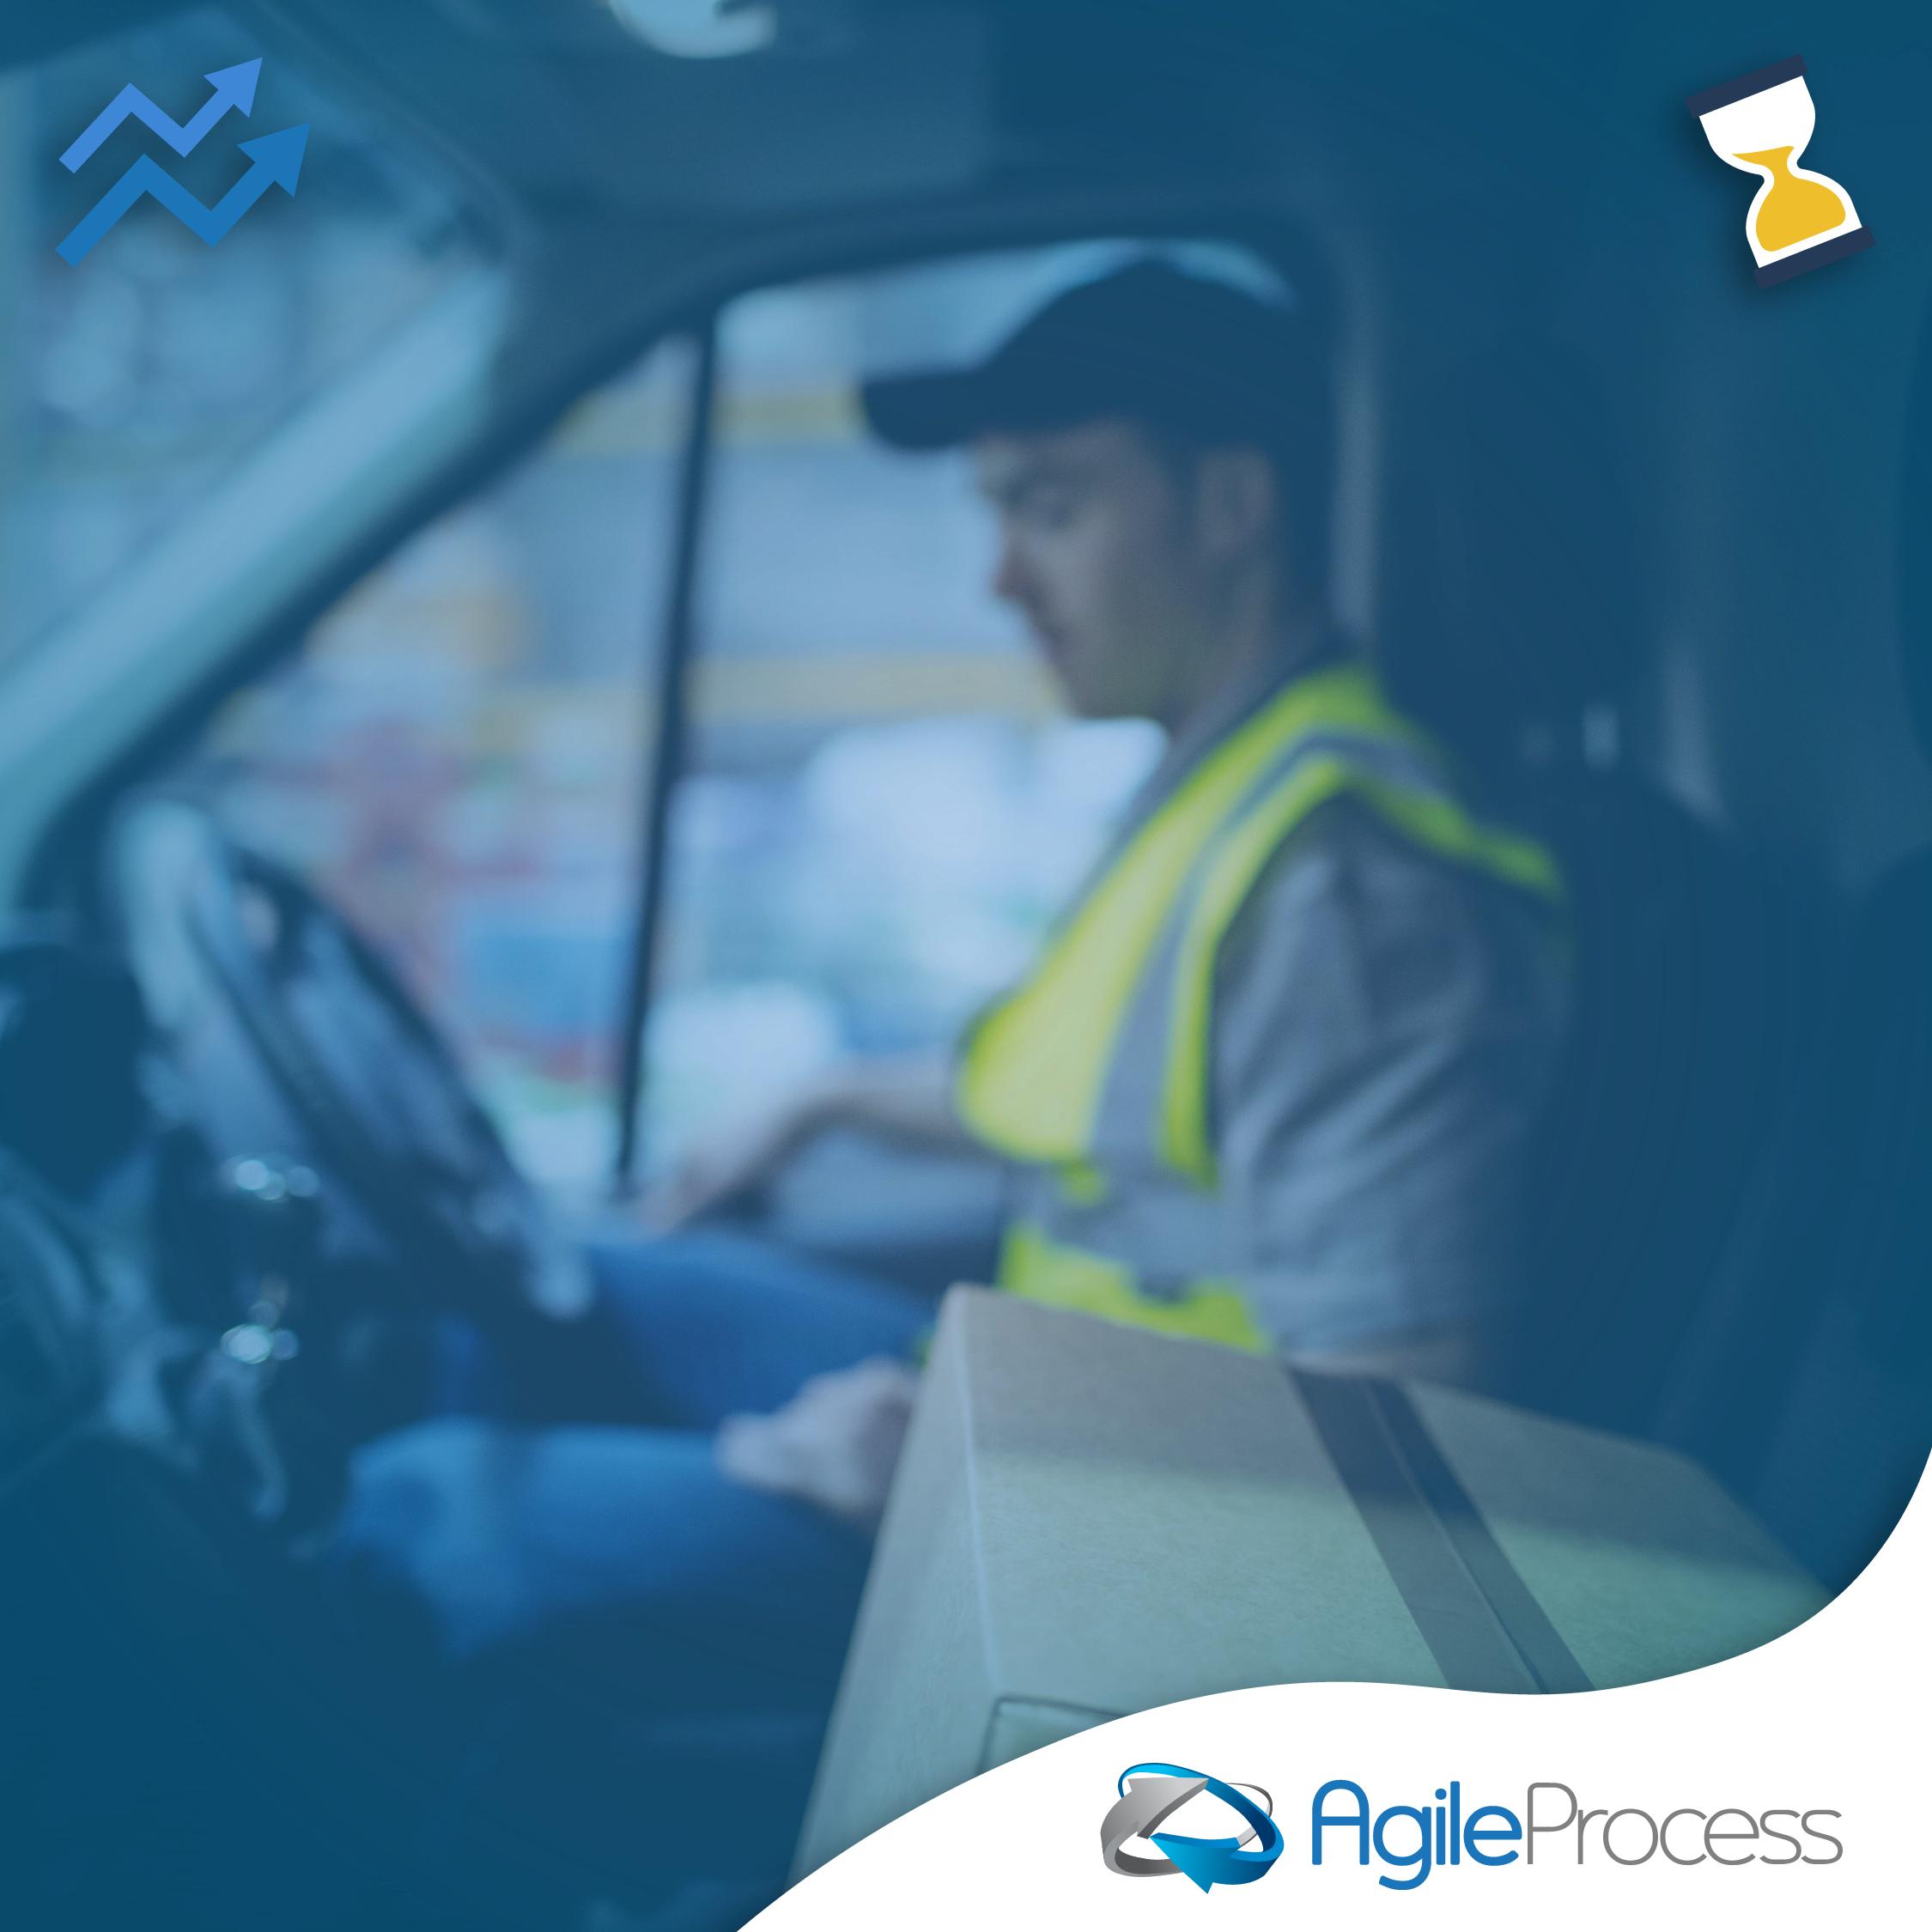 produtividade dos motoristas na logística agileprocess